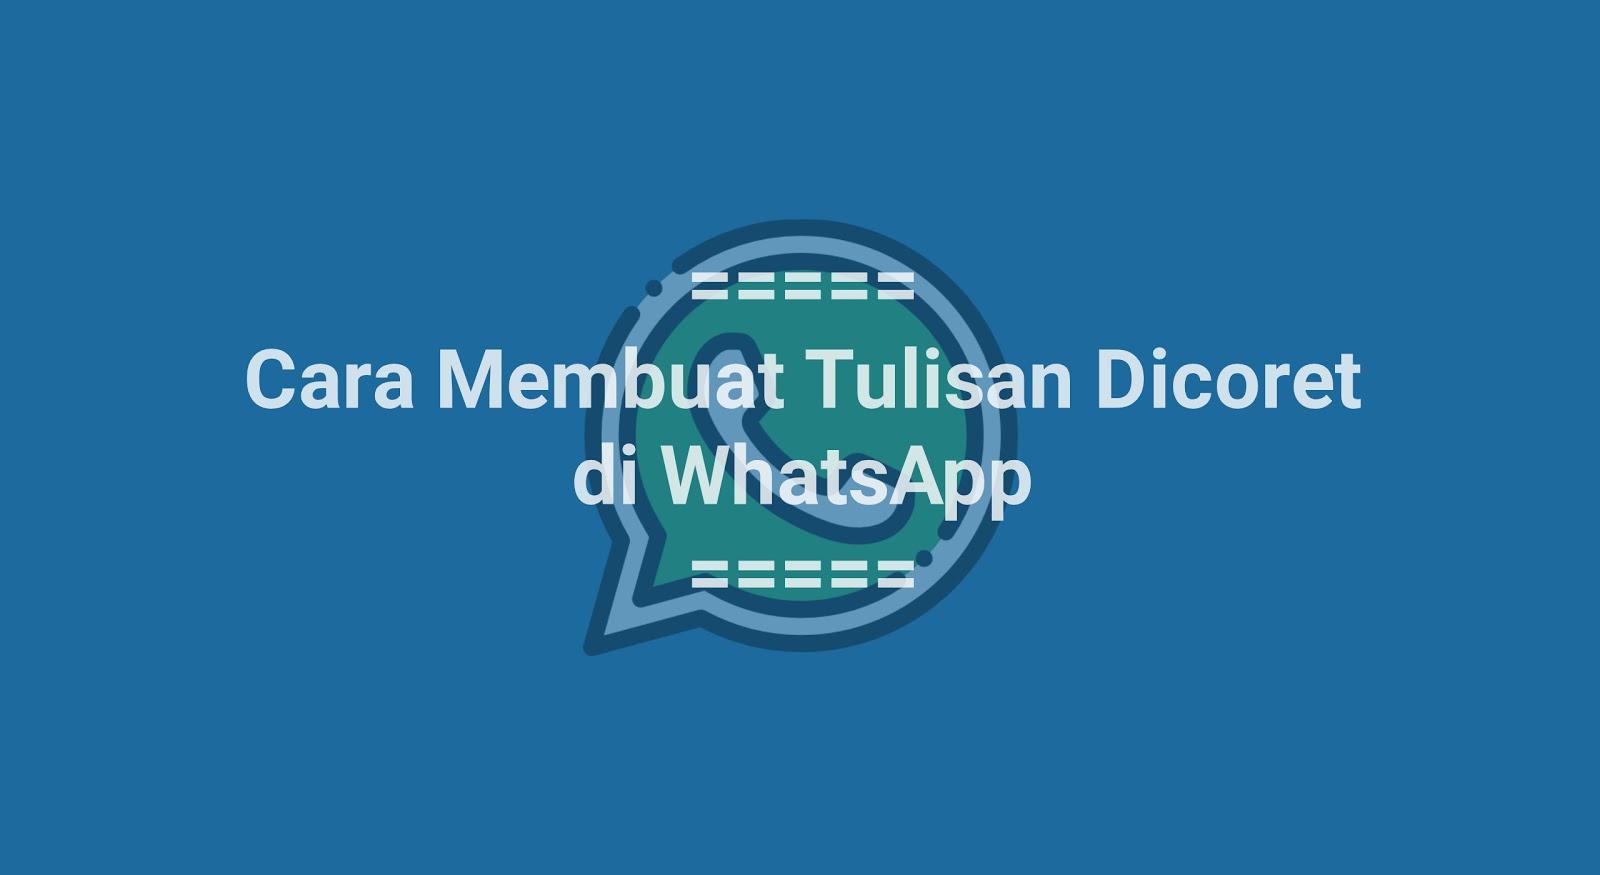 Cara Membuat Tulisan Dicoret di Whatsapp